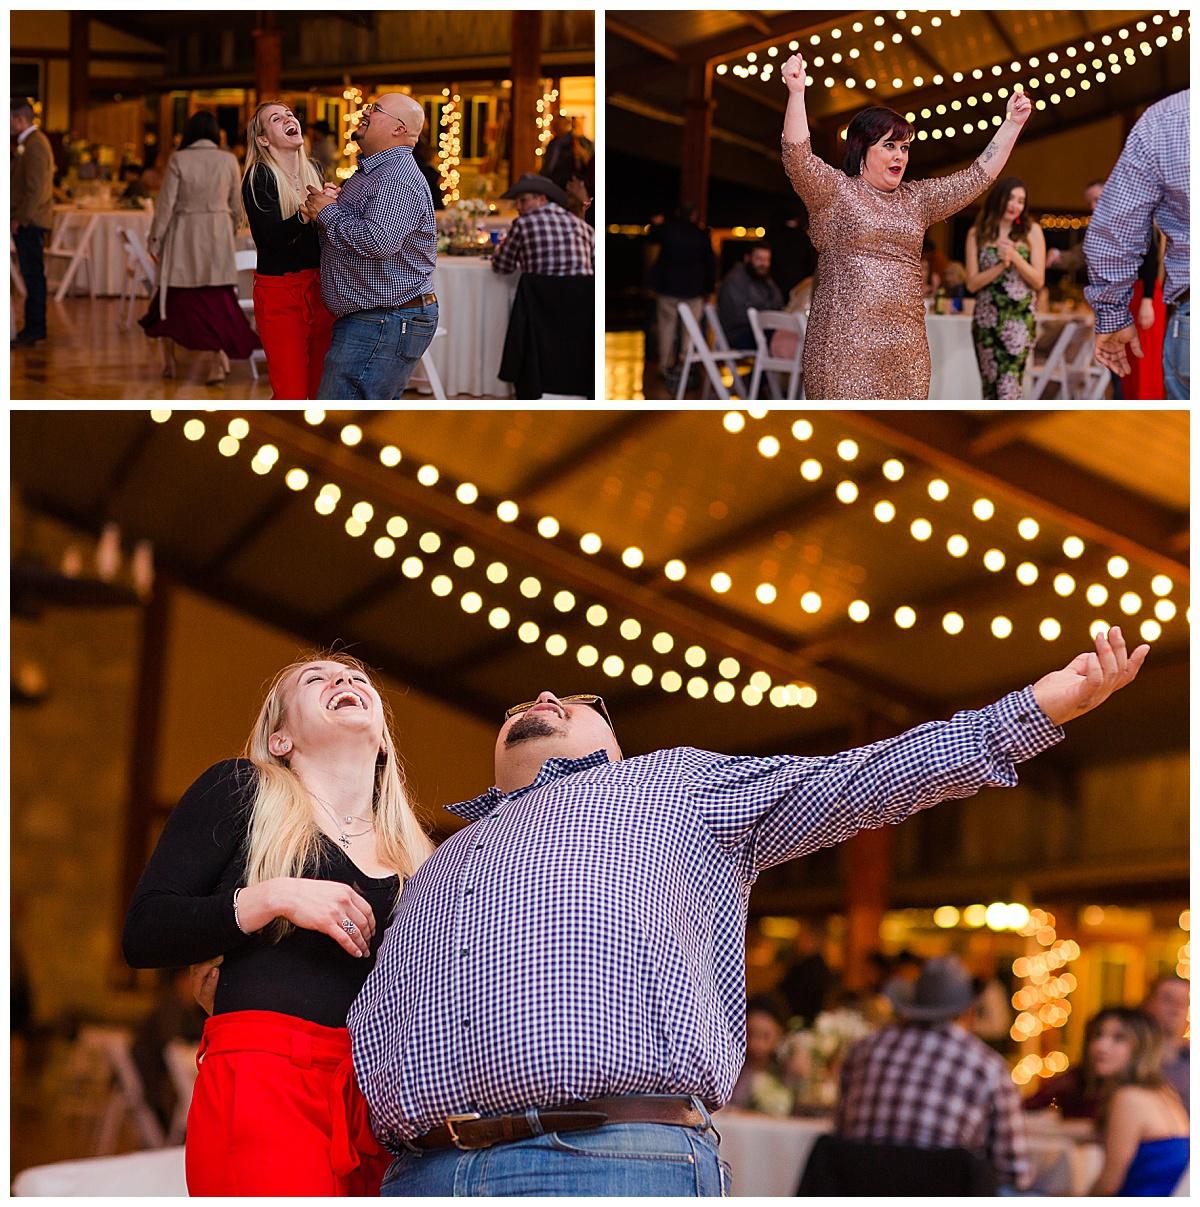 Wedding-Photographer-Texas-Hill-Country-Happy-H-Ranch-Comfor-Texas-Carly-Barton-Photography_0089.jpg